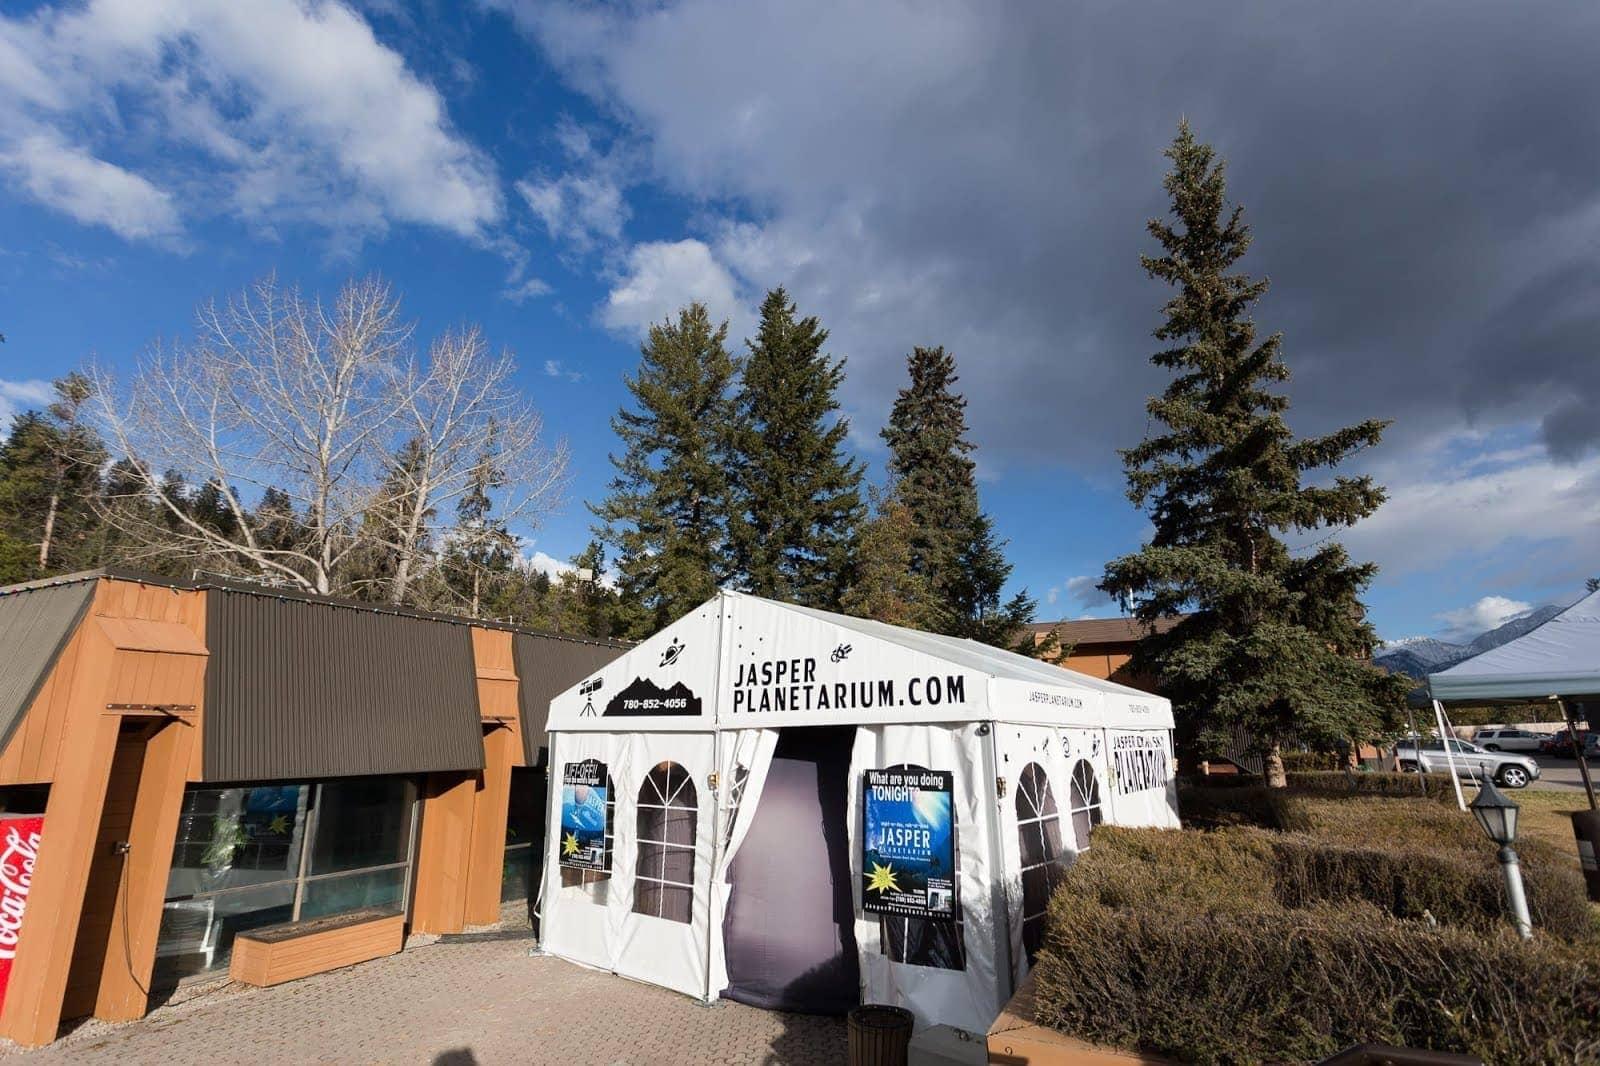 Jasper Dark Sky Festival Centennial Park events by Laurence Norah